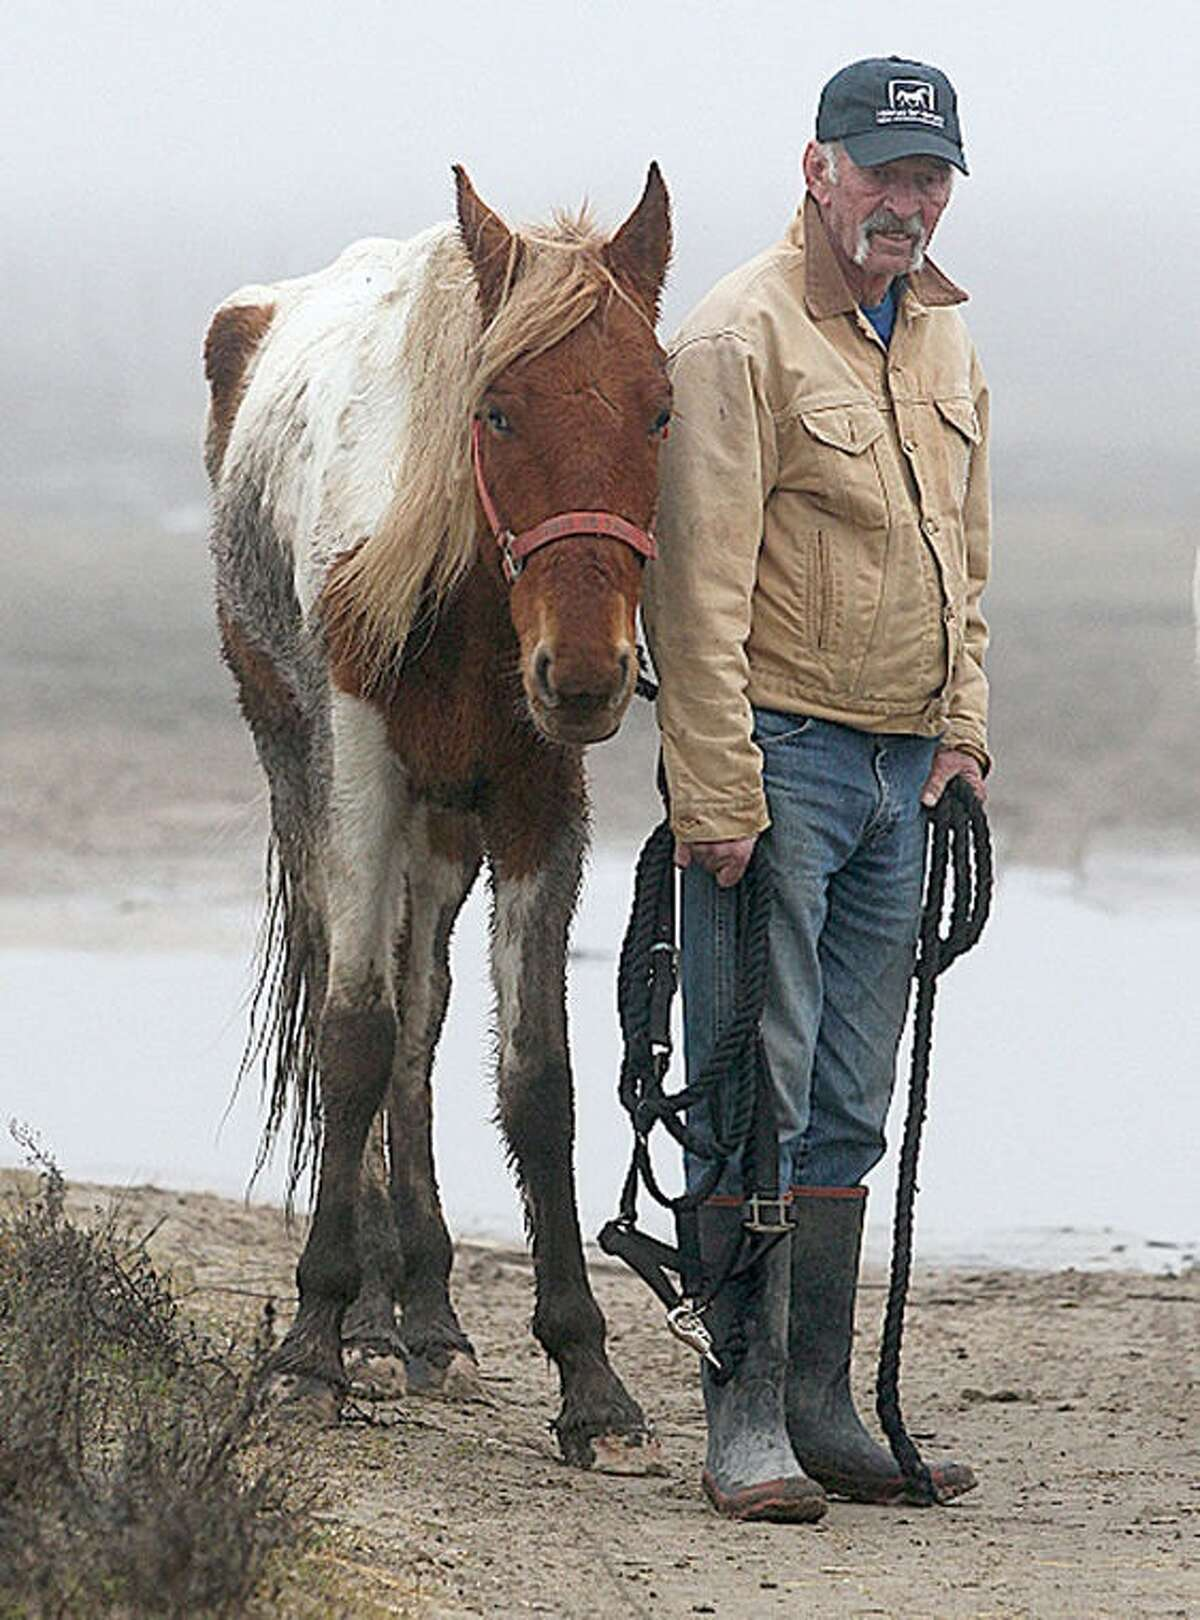 Galveston police seized 27 horses from S-n-G Horseback Riding in Jamaica Beach.